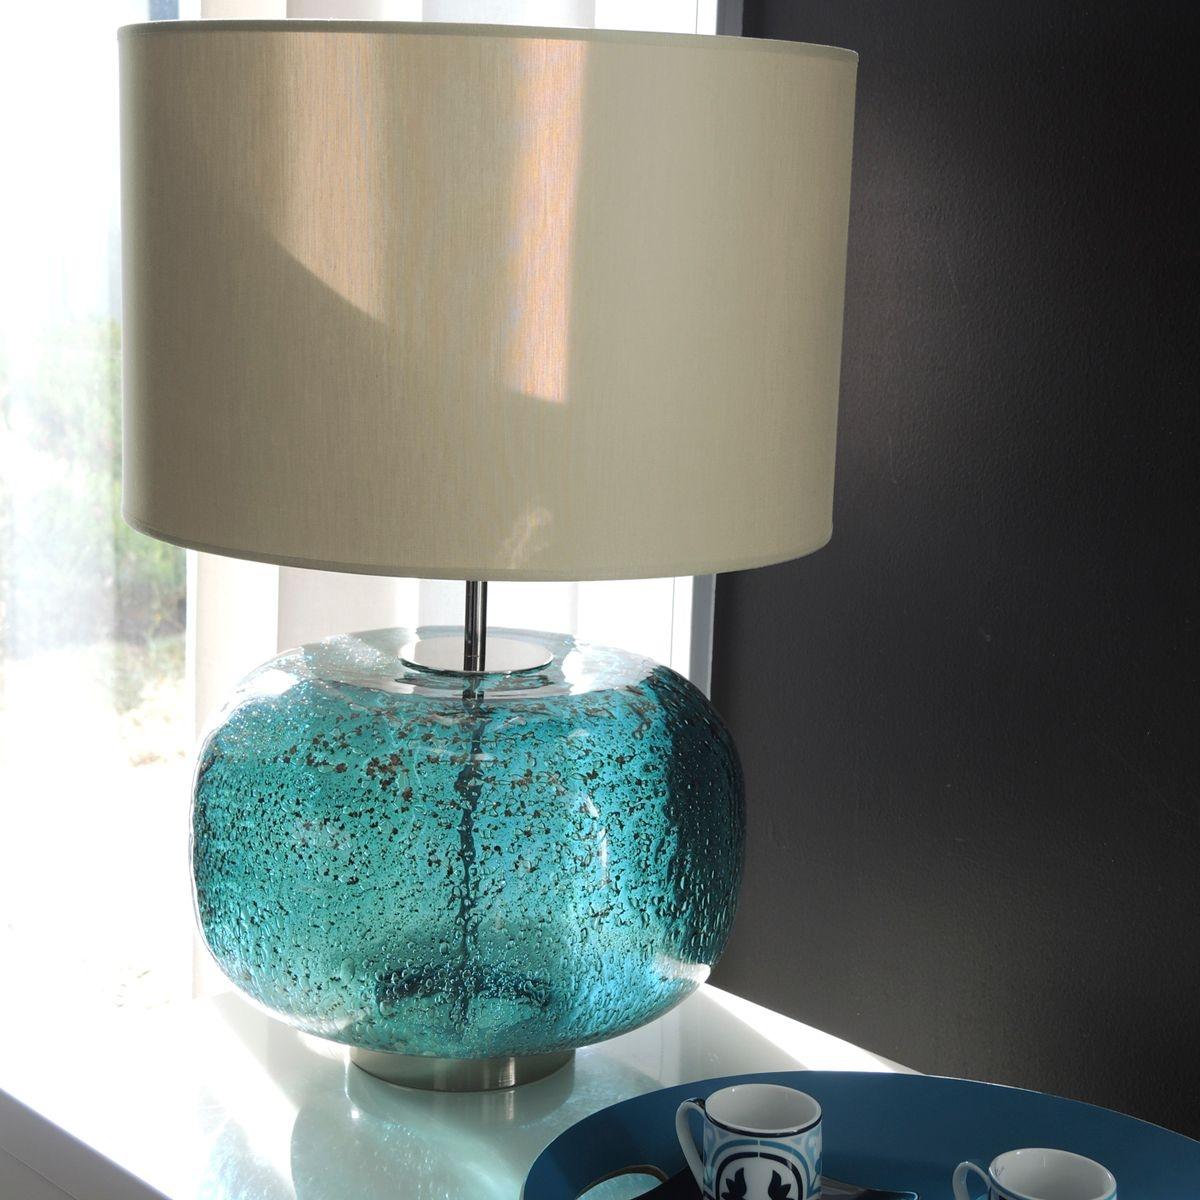 lampe en verre bleu avec abat-jour 55cm - derby bleu canard bruno evrard